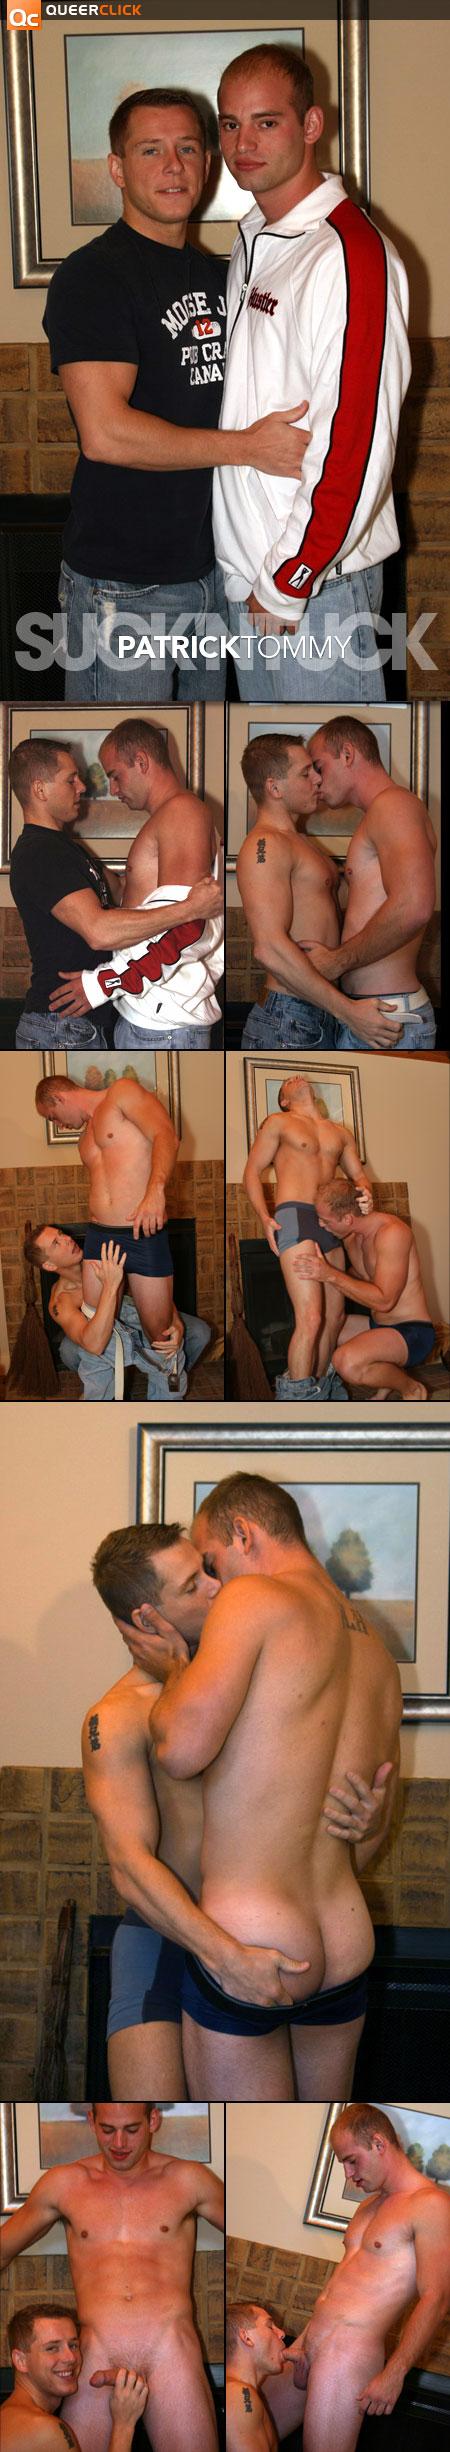 tdx tommy patrick 01 Brooke Hogan's Ass Gets a Rub from… Her Dad!? Brooke Hogan Bikini Ass Rub ...